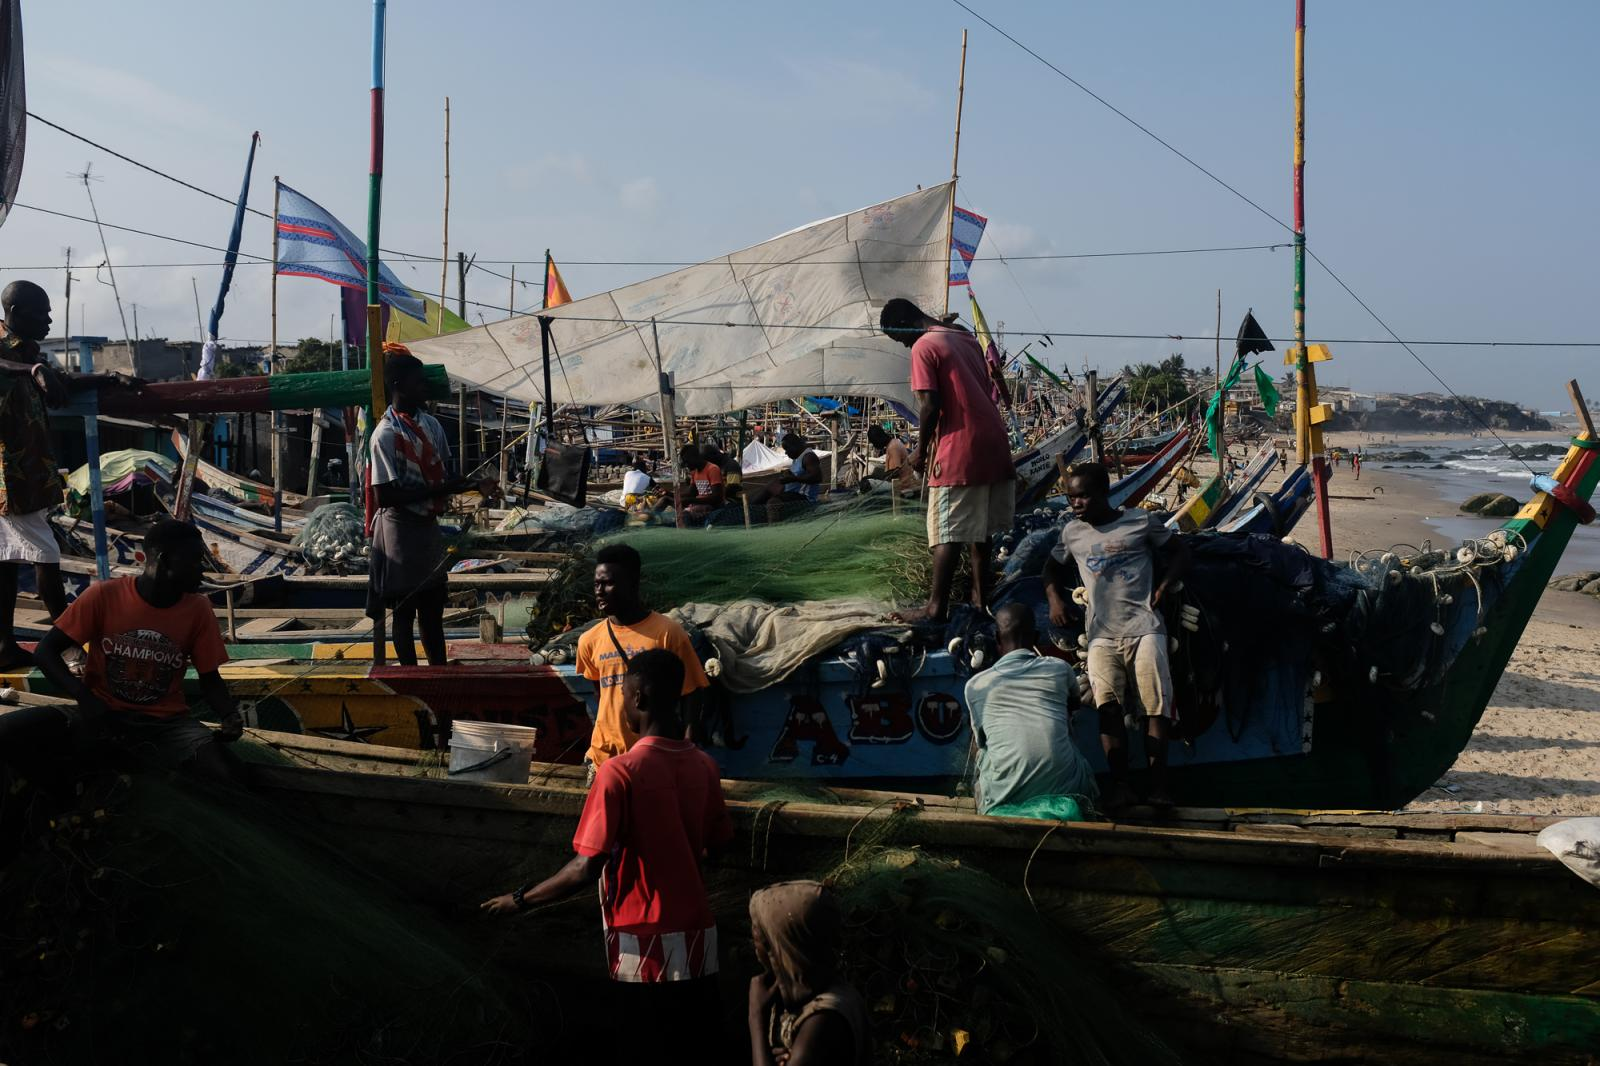 Photography image - Loading nipah-dennis-community-winneba-everydayafrica-02.JPG